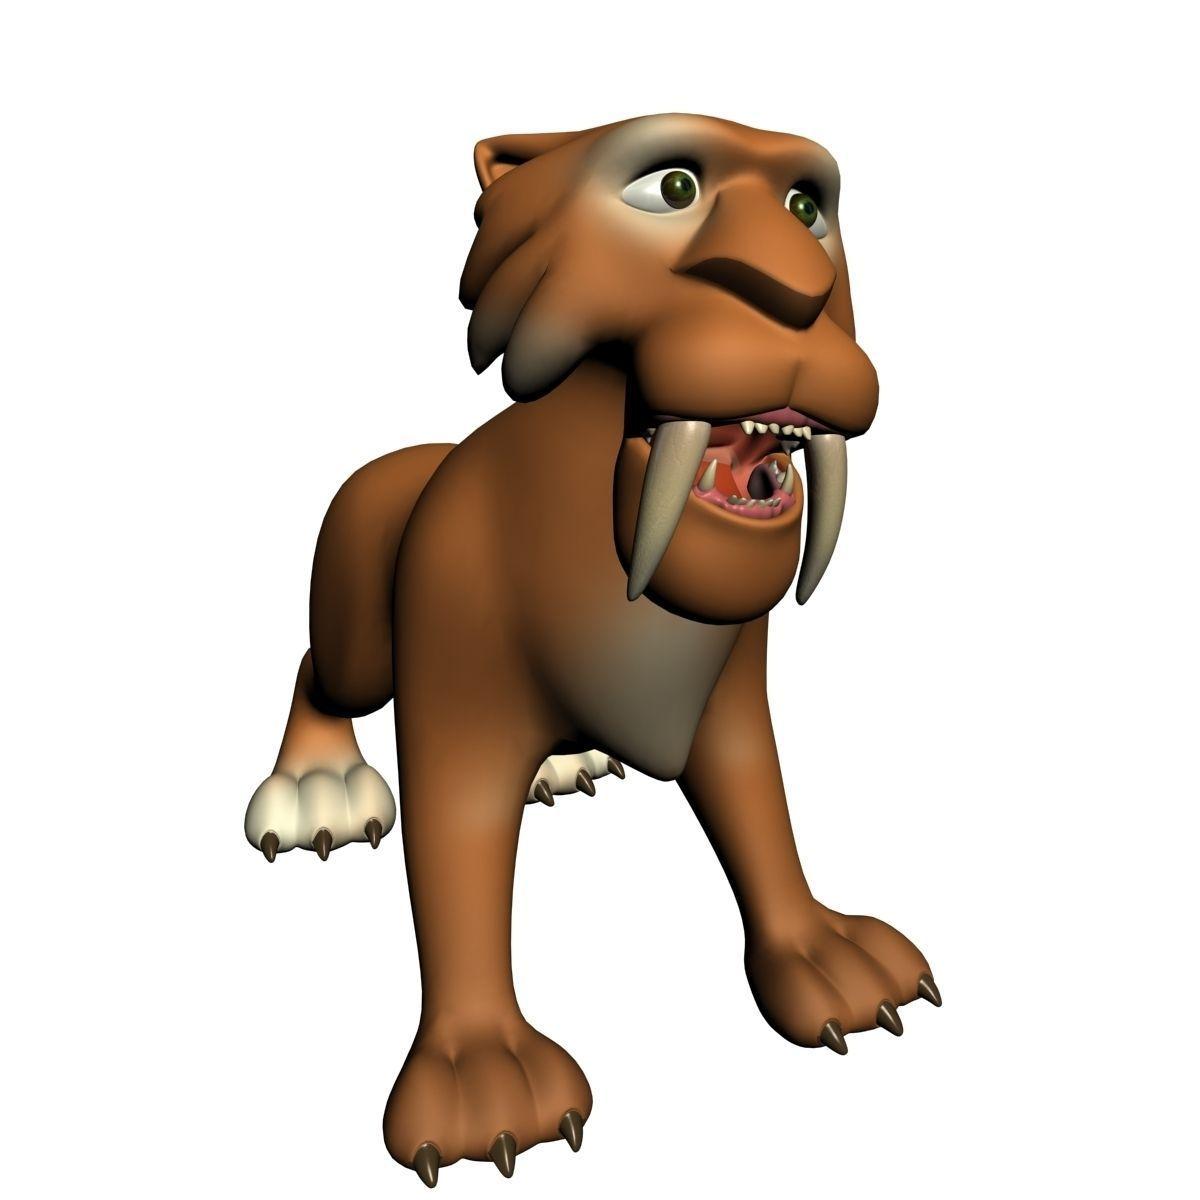 3d model cartoon sabertooth tiger rigged cgtrader rh cgtrader com cartoon sabre tooth tiger Cartoon Sloth